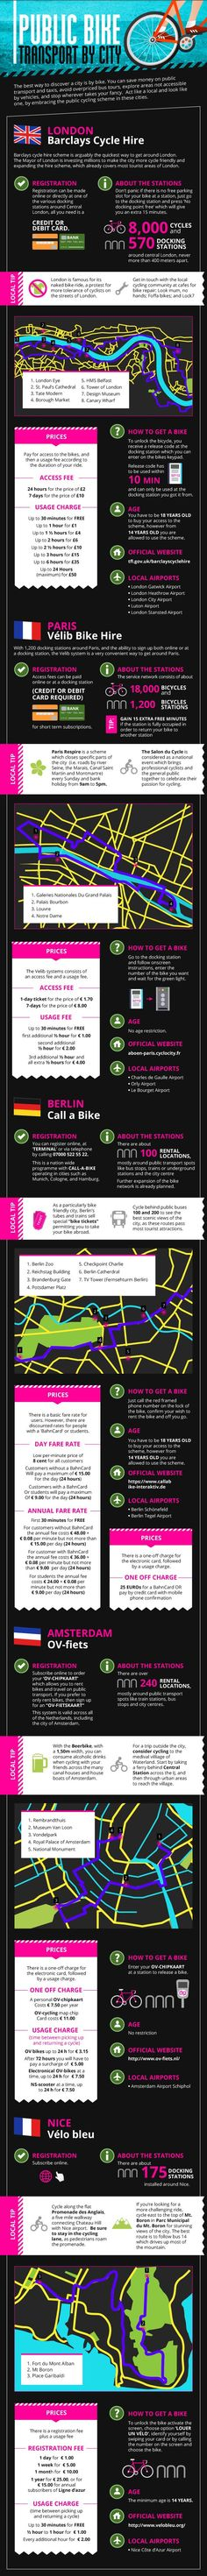 Public City Bikes In Europe infographic  by momondo